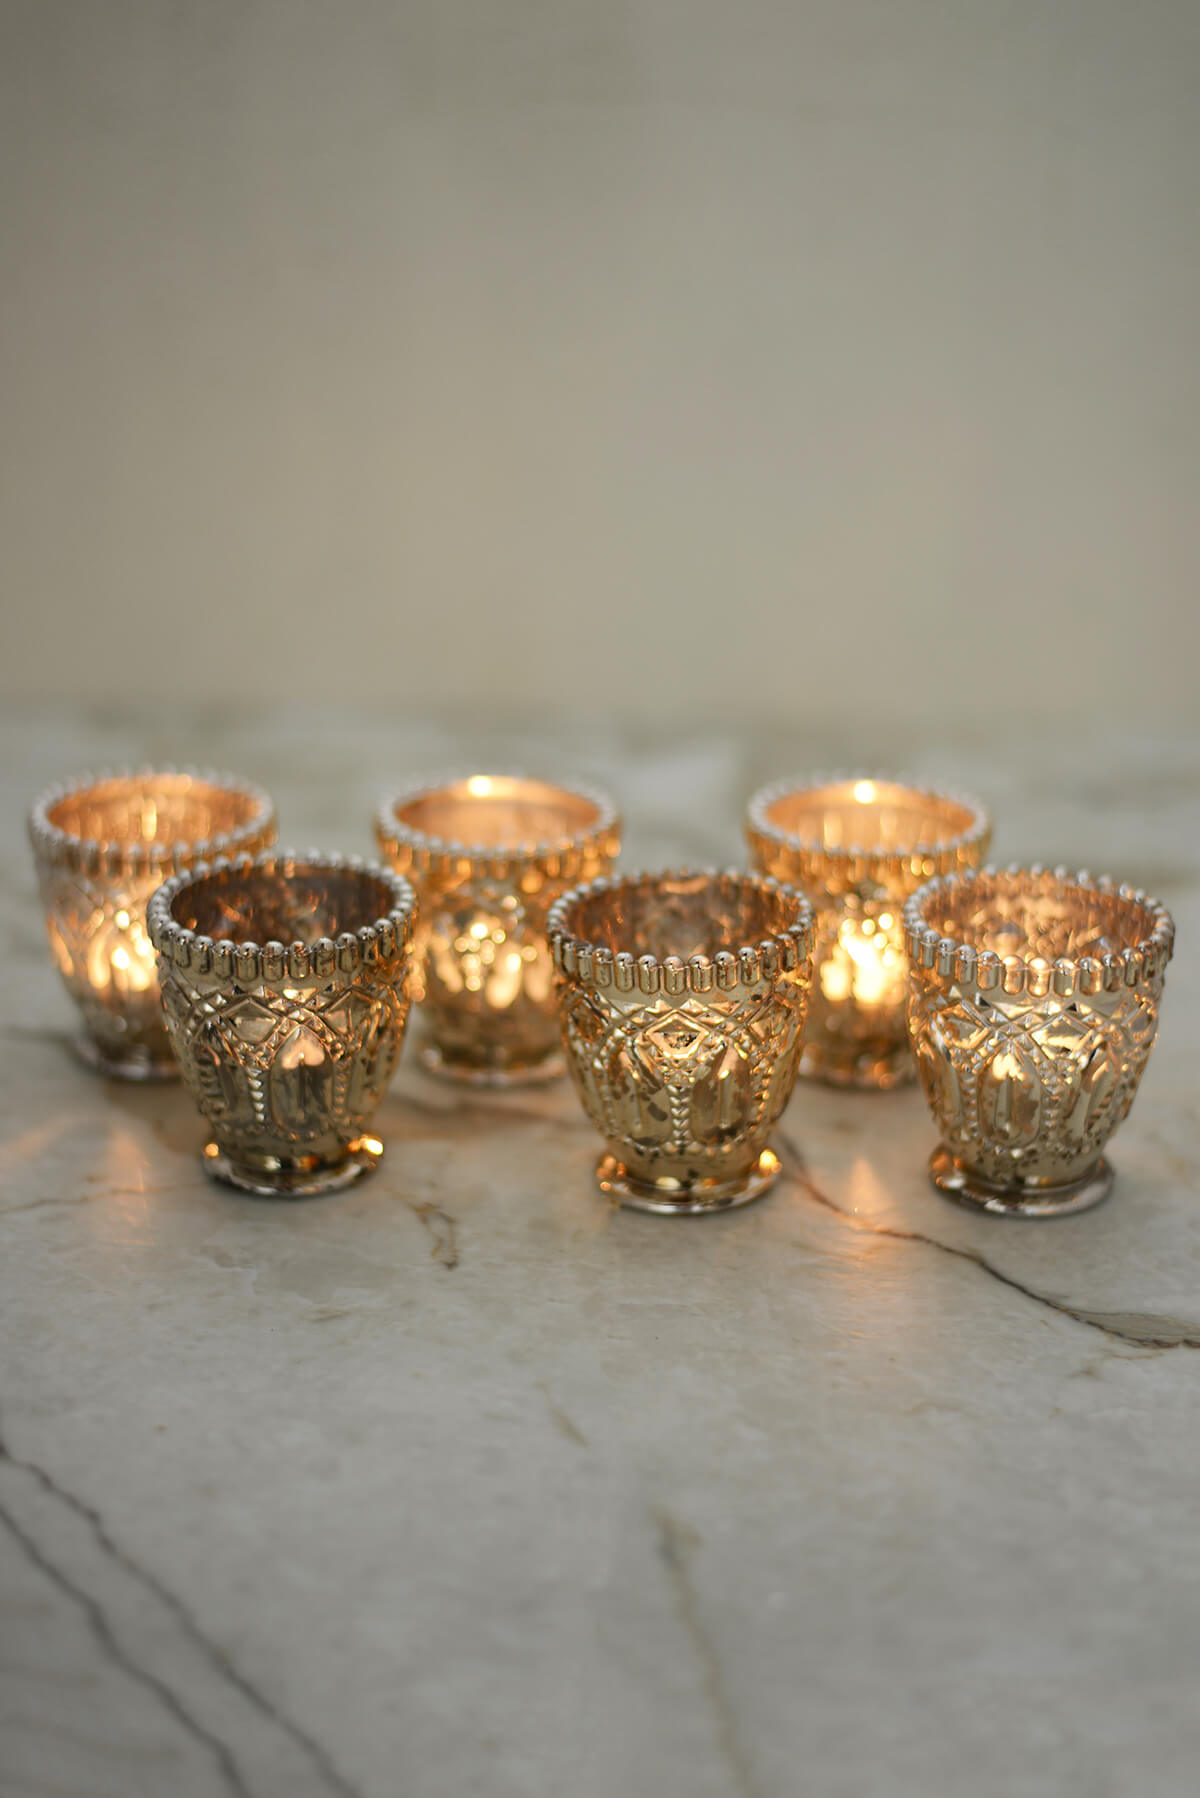 6 Mercury Glass Votive Candle Holders